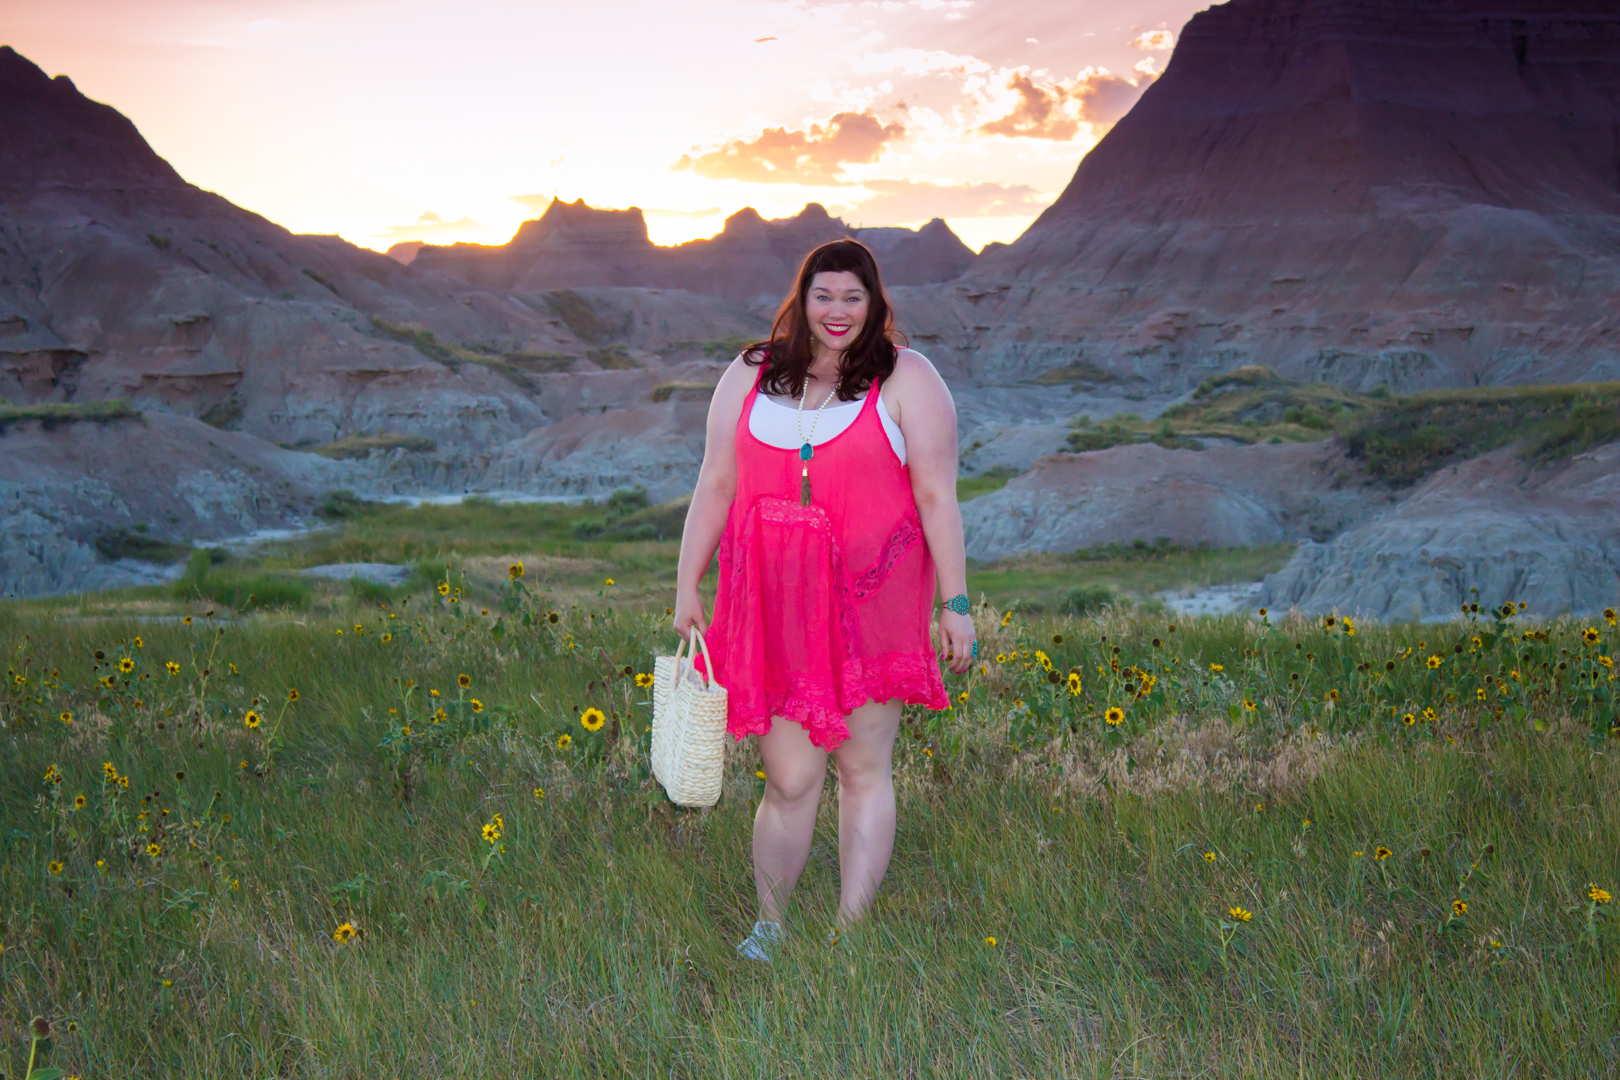 Loralette Review, Style Plus Curves, Chicago Blogger, Chicago Plus Size Blogger, Plus Size Blogger, Amber McCulloch, Loralette, Avenue Plus, Pink Babydoll Dress, South Dakota, Badlands National Park